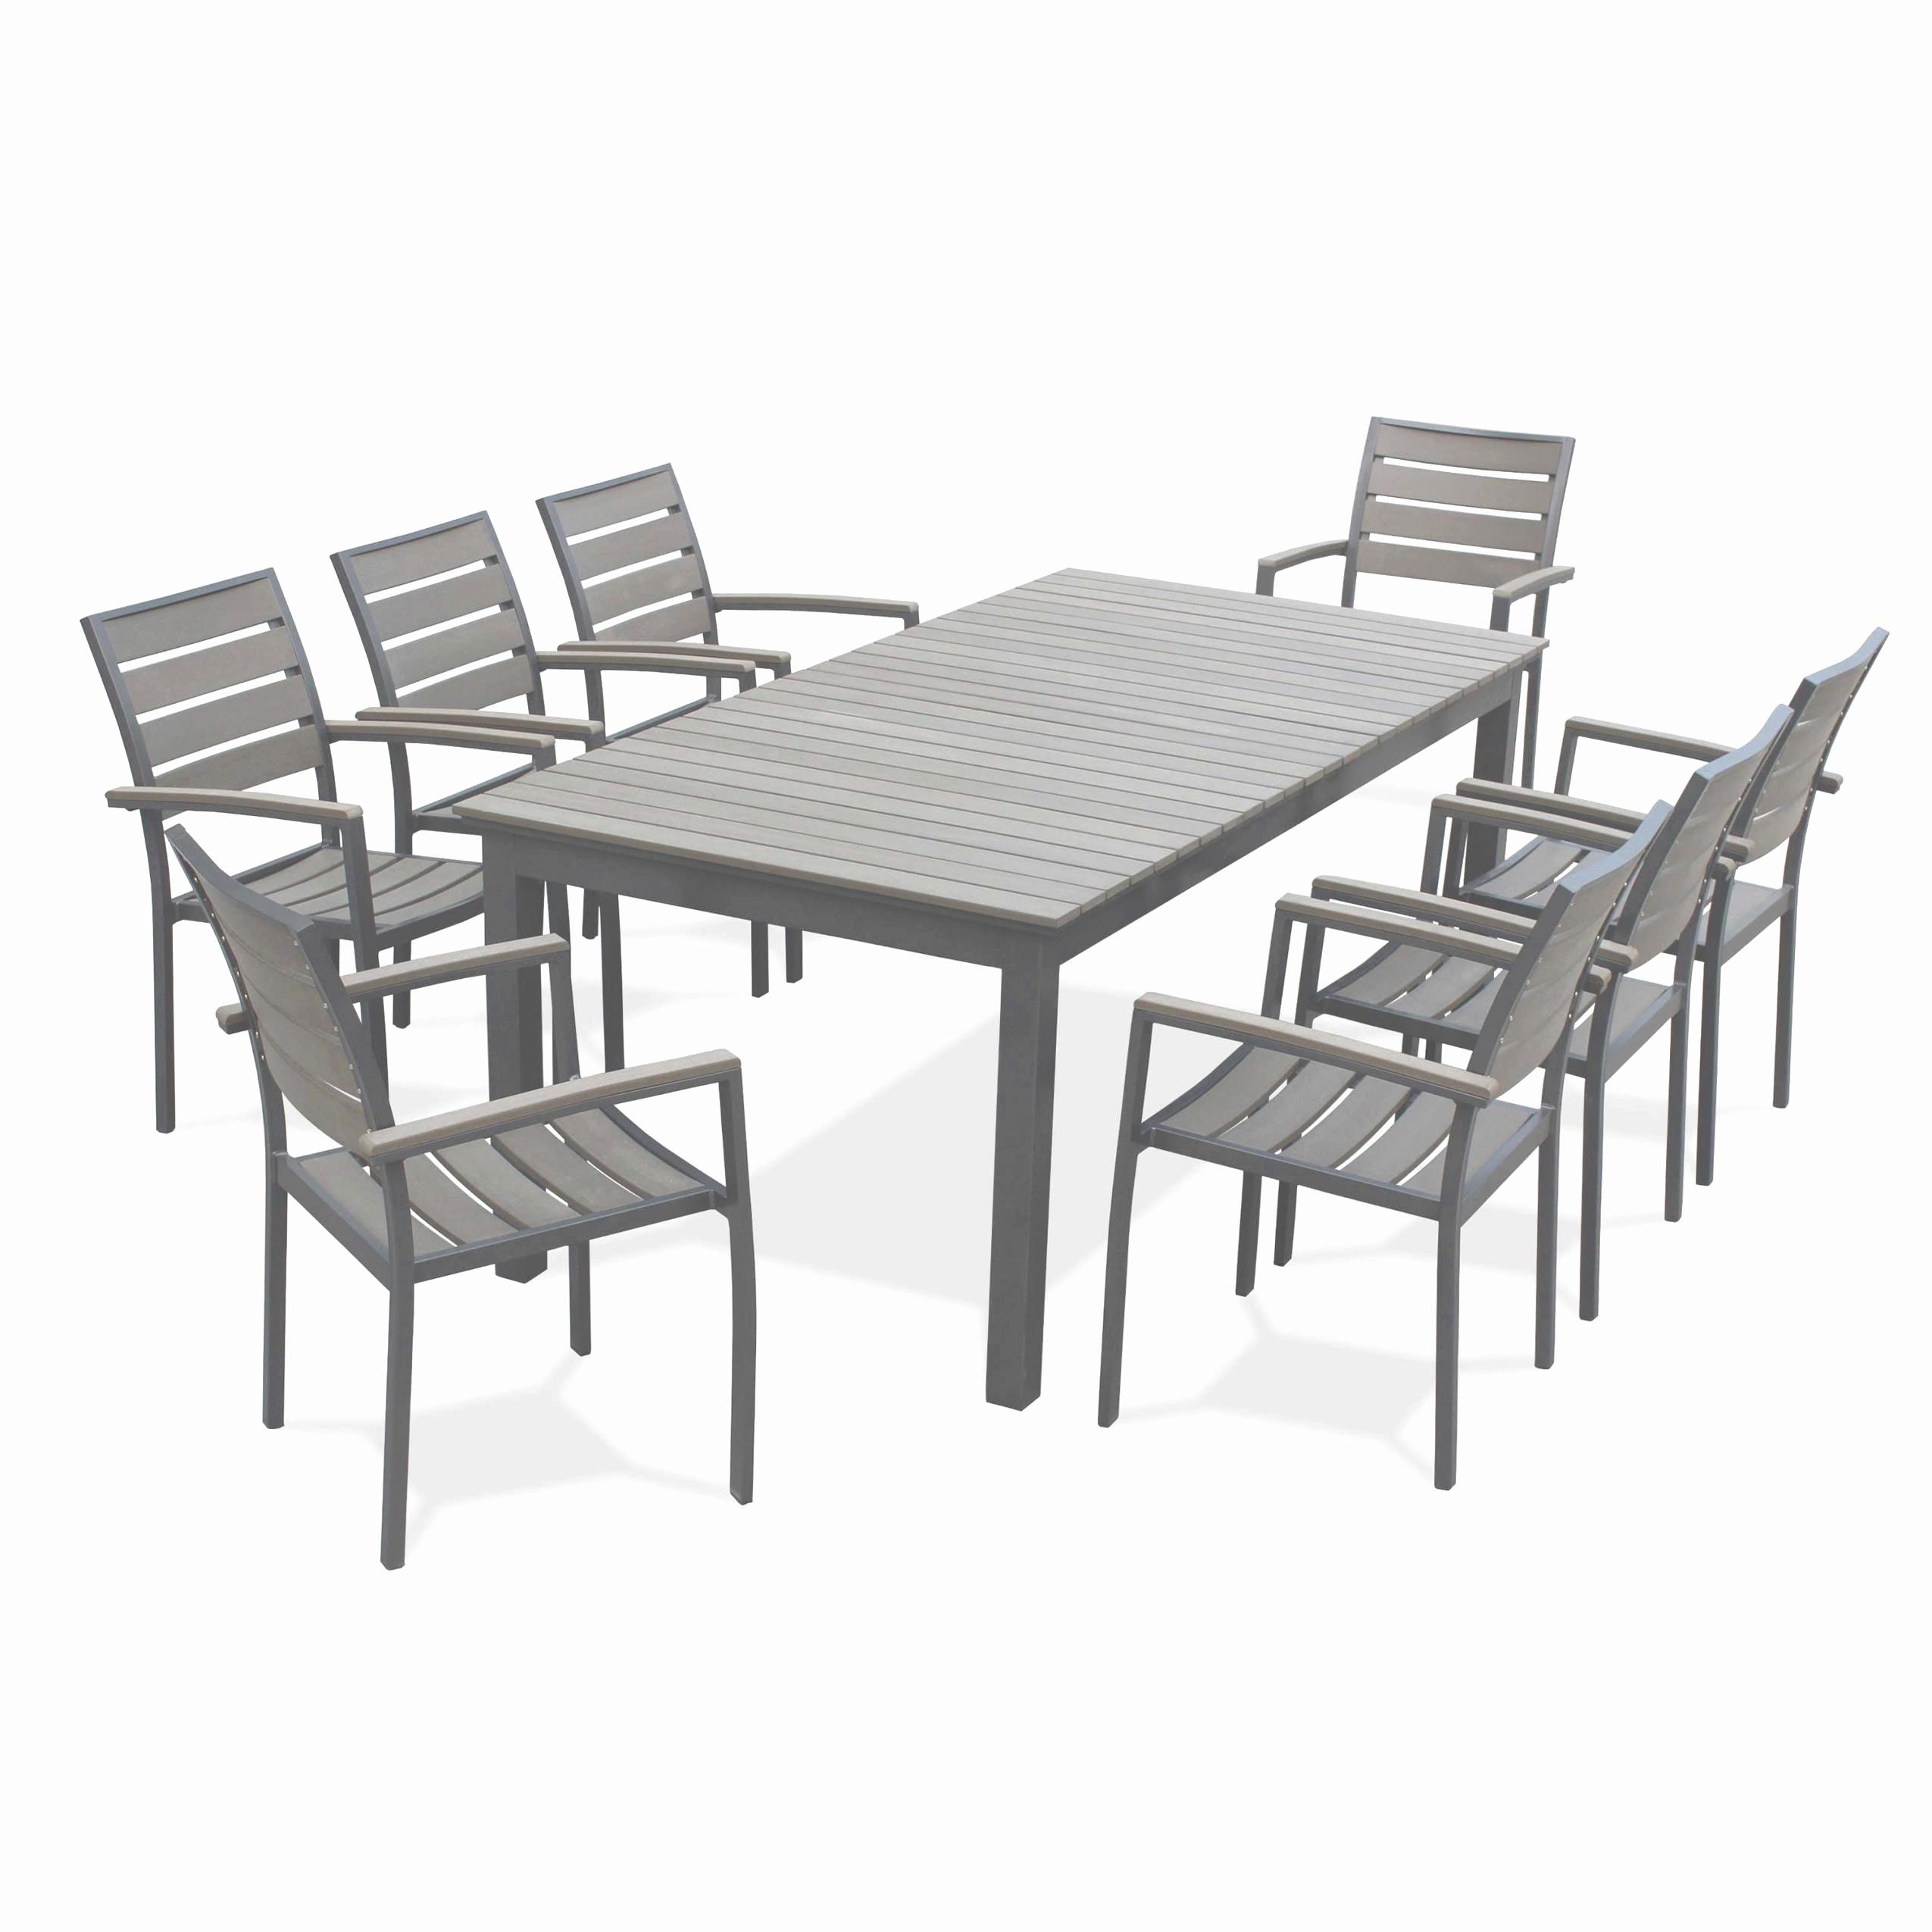 chaise hesperide pas cher beau ruse salon de jardin extensible et table de jardin metal inspirant of chaise hesperide pas cher